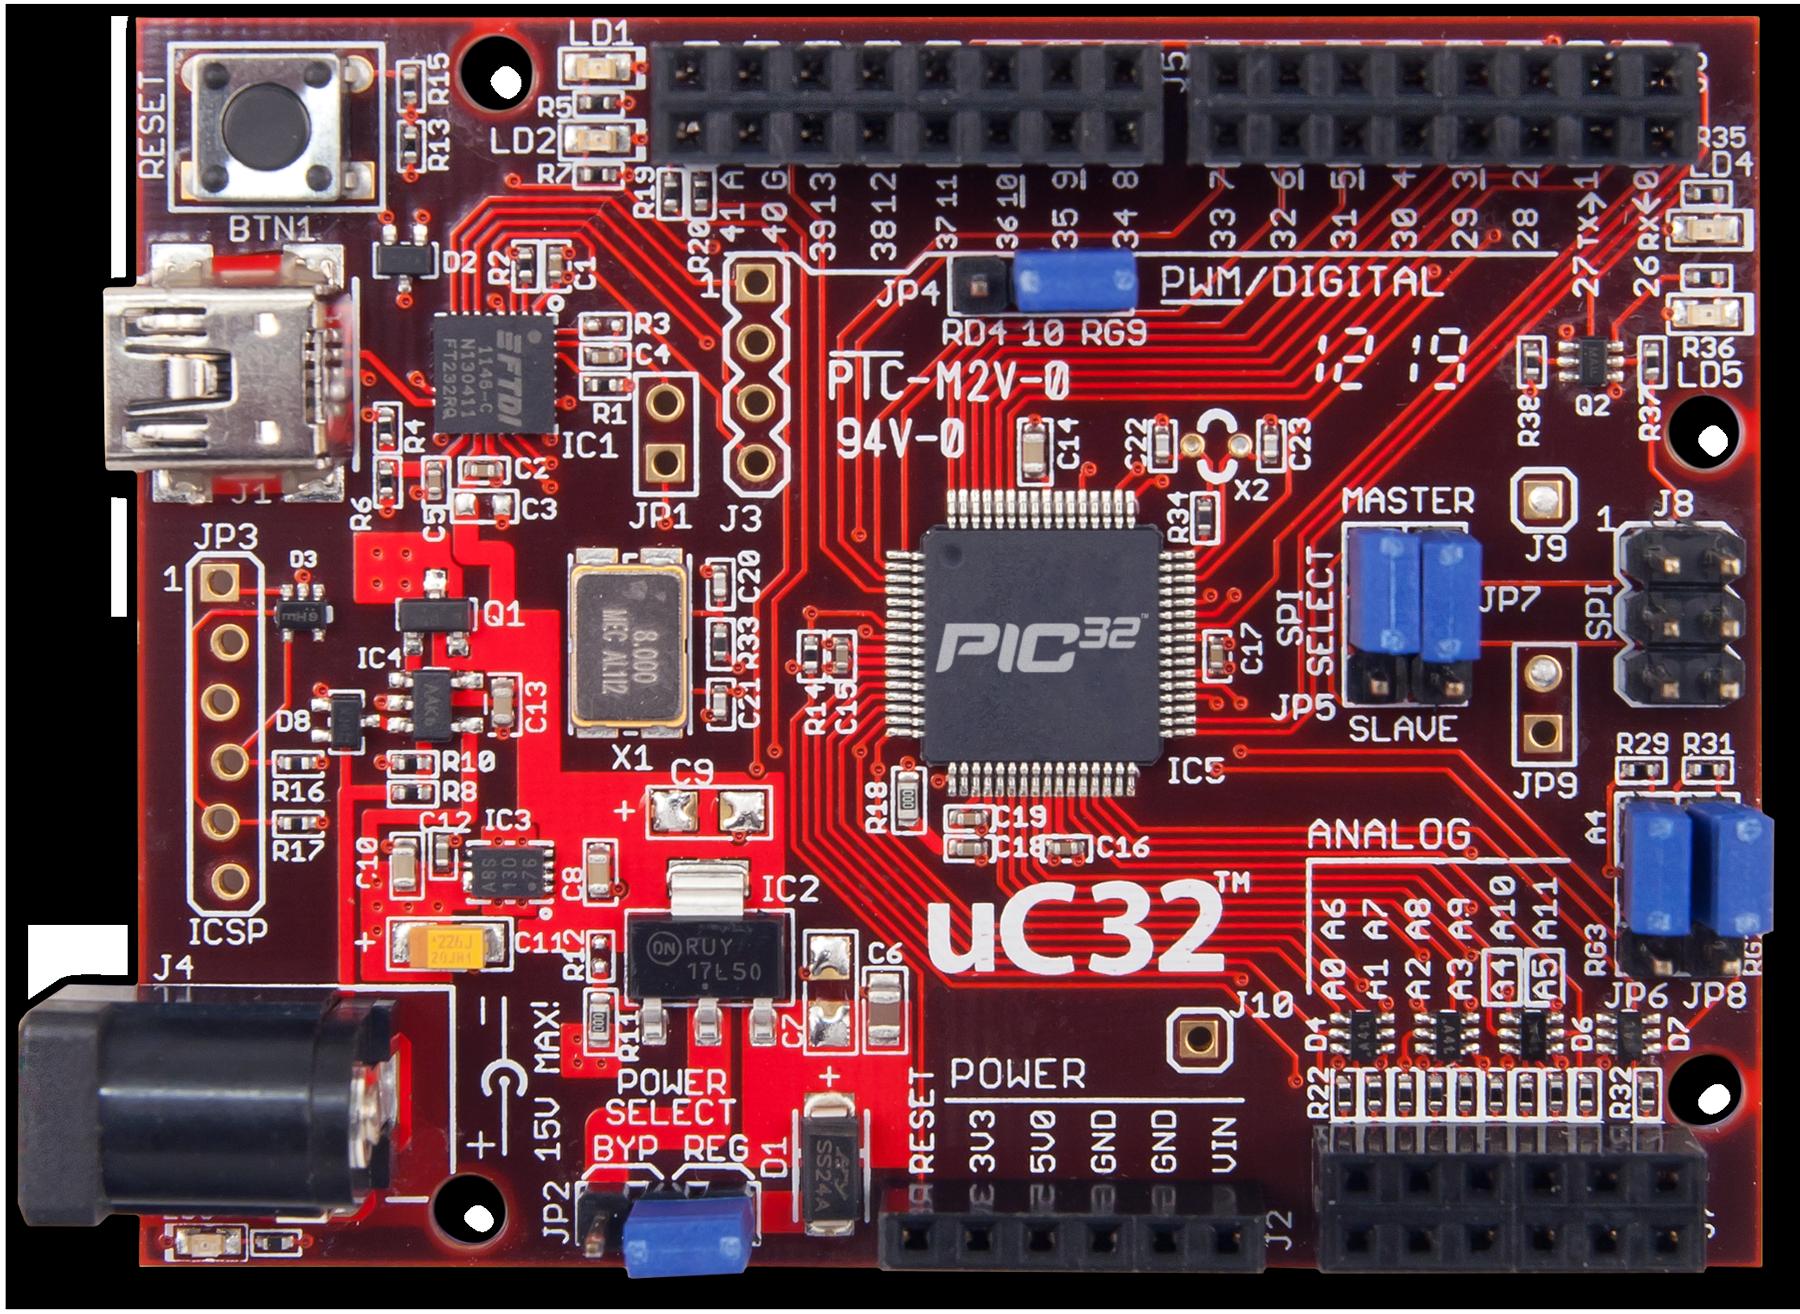 chipkit_uc32:chipkit-uc32-top-1800.png